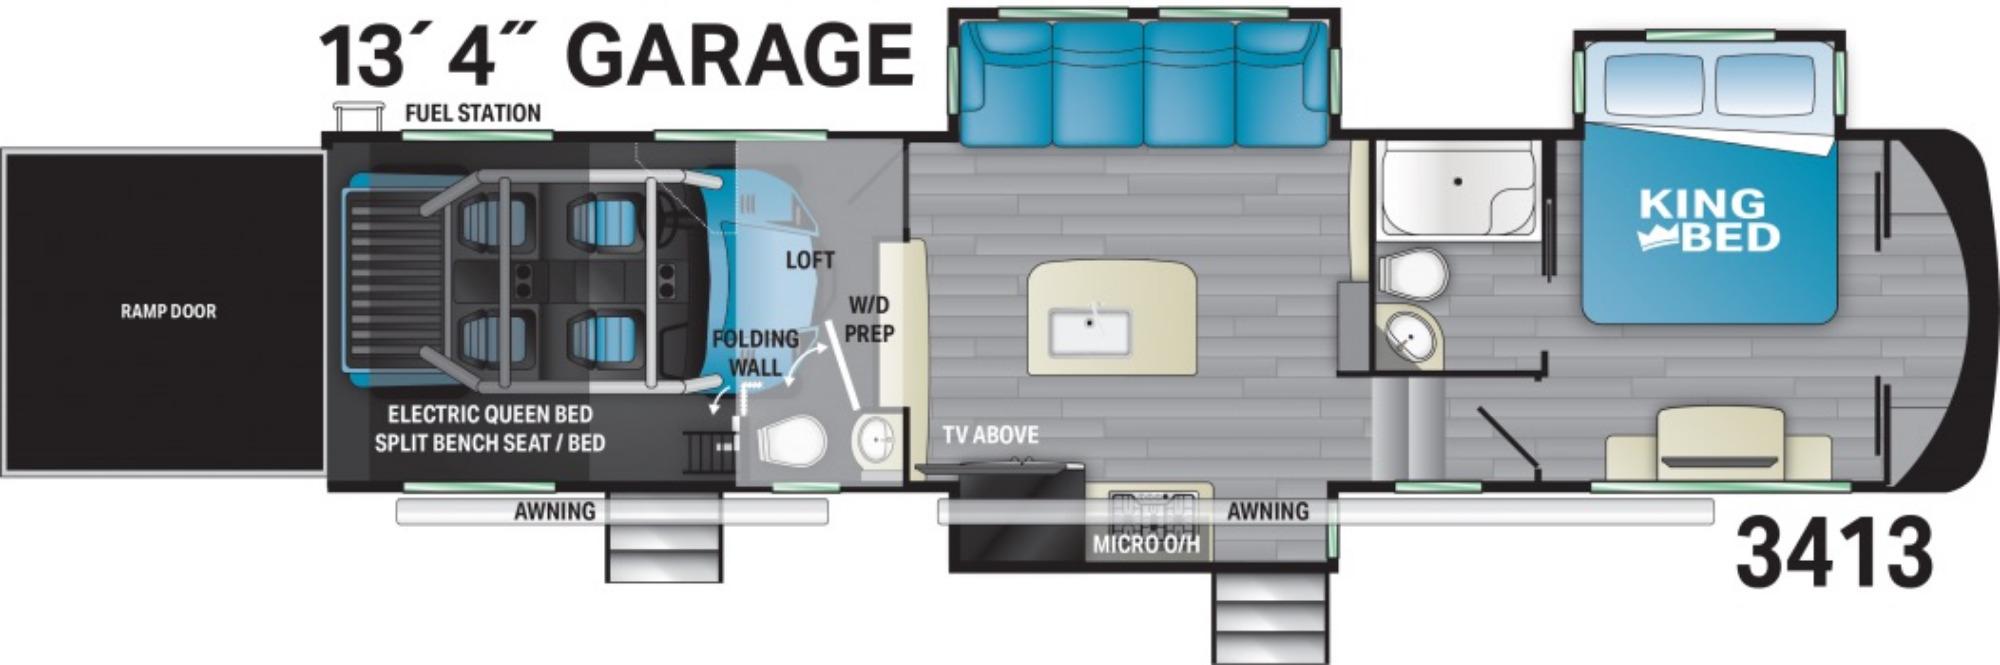 View Floor Plan for 2021 HEARTLAND CYCLONE 3413